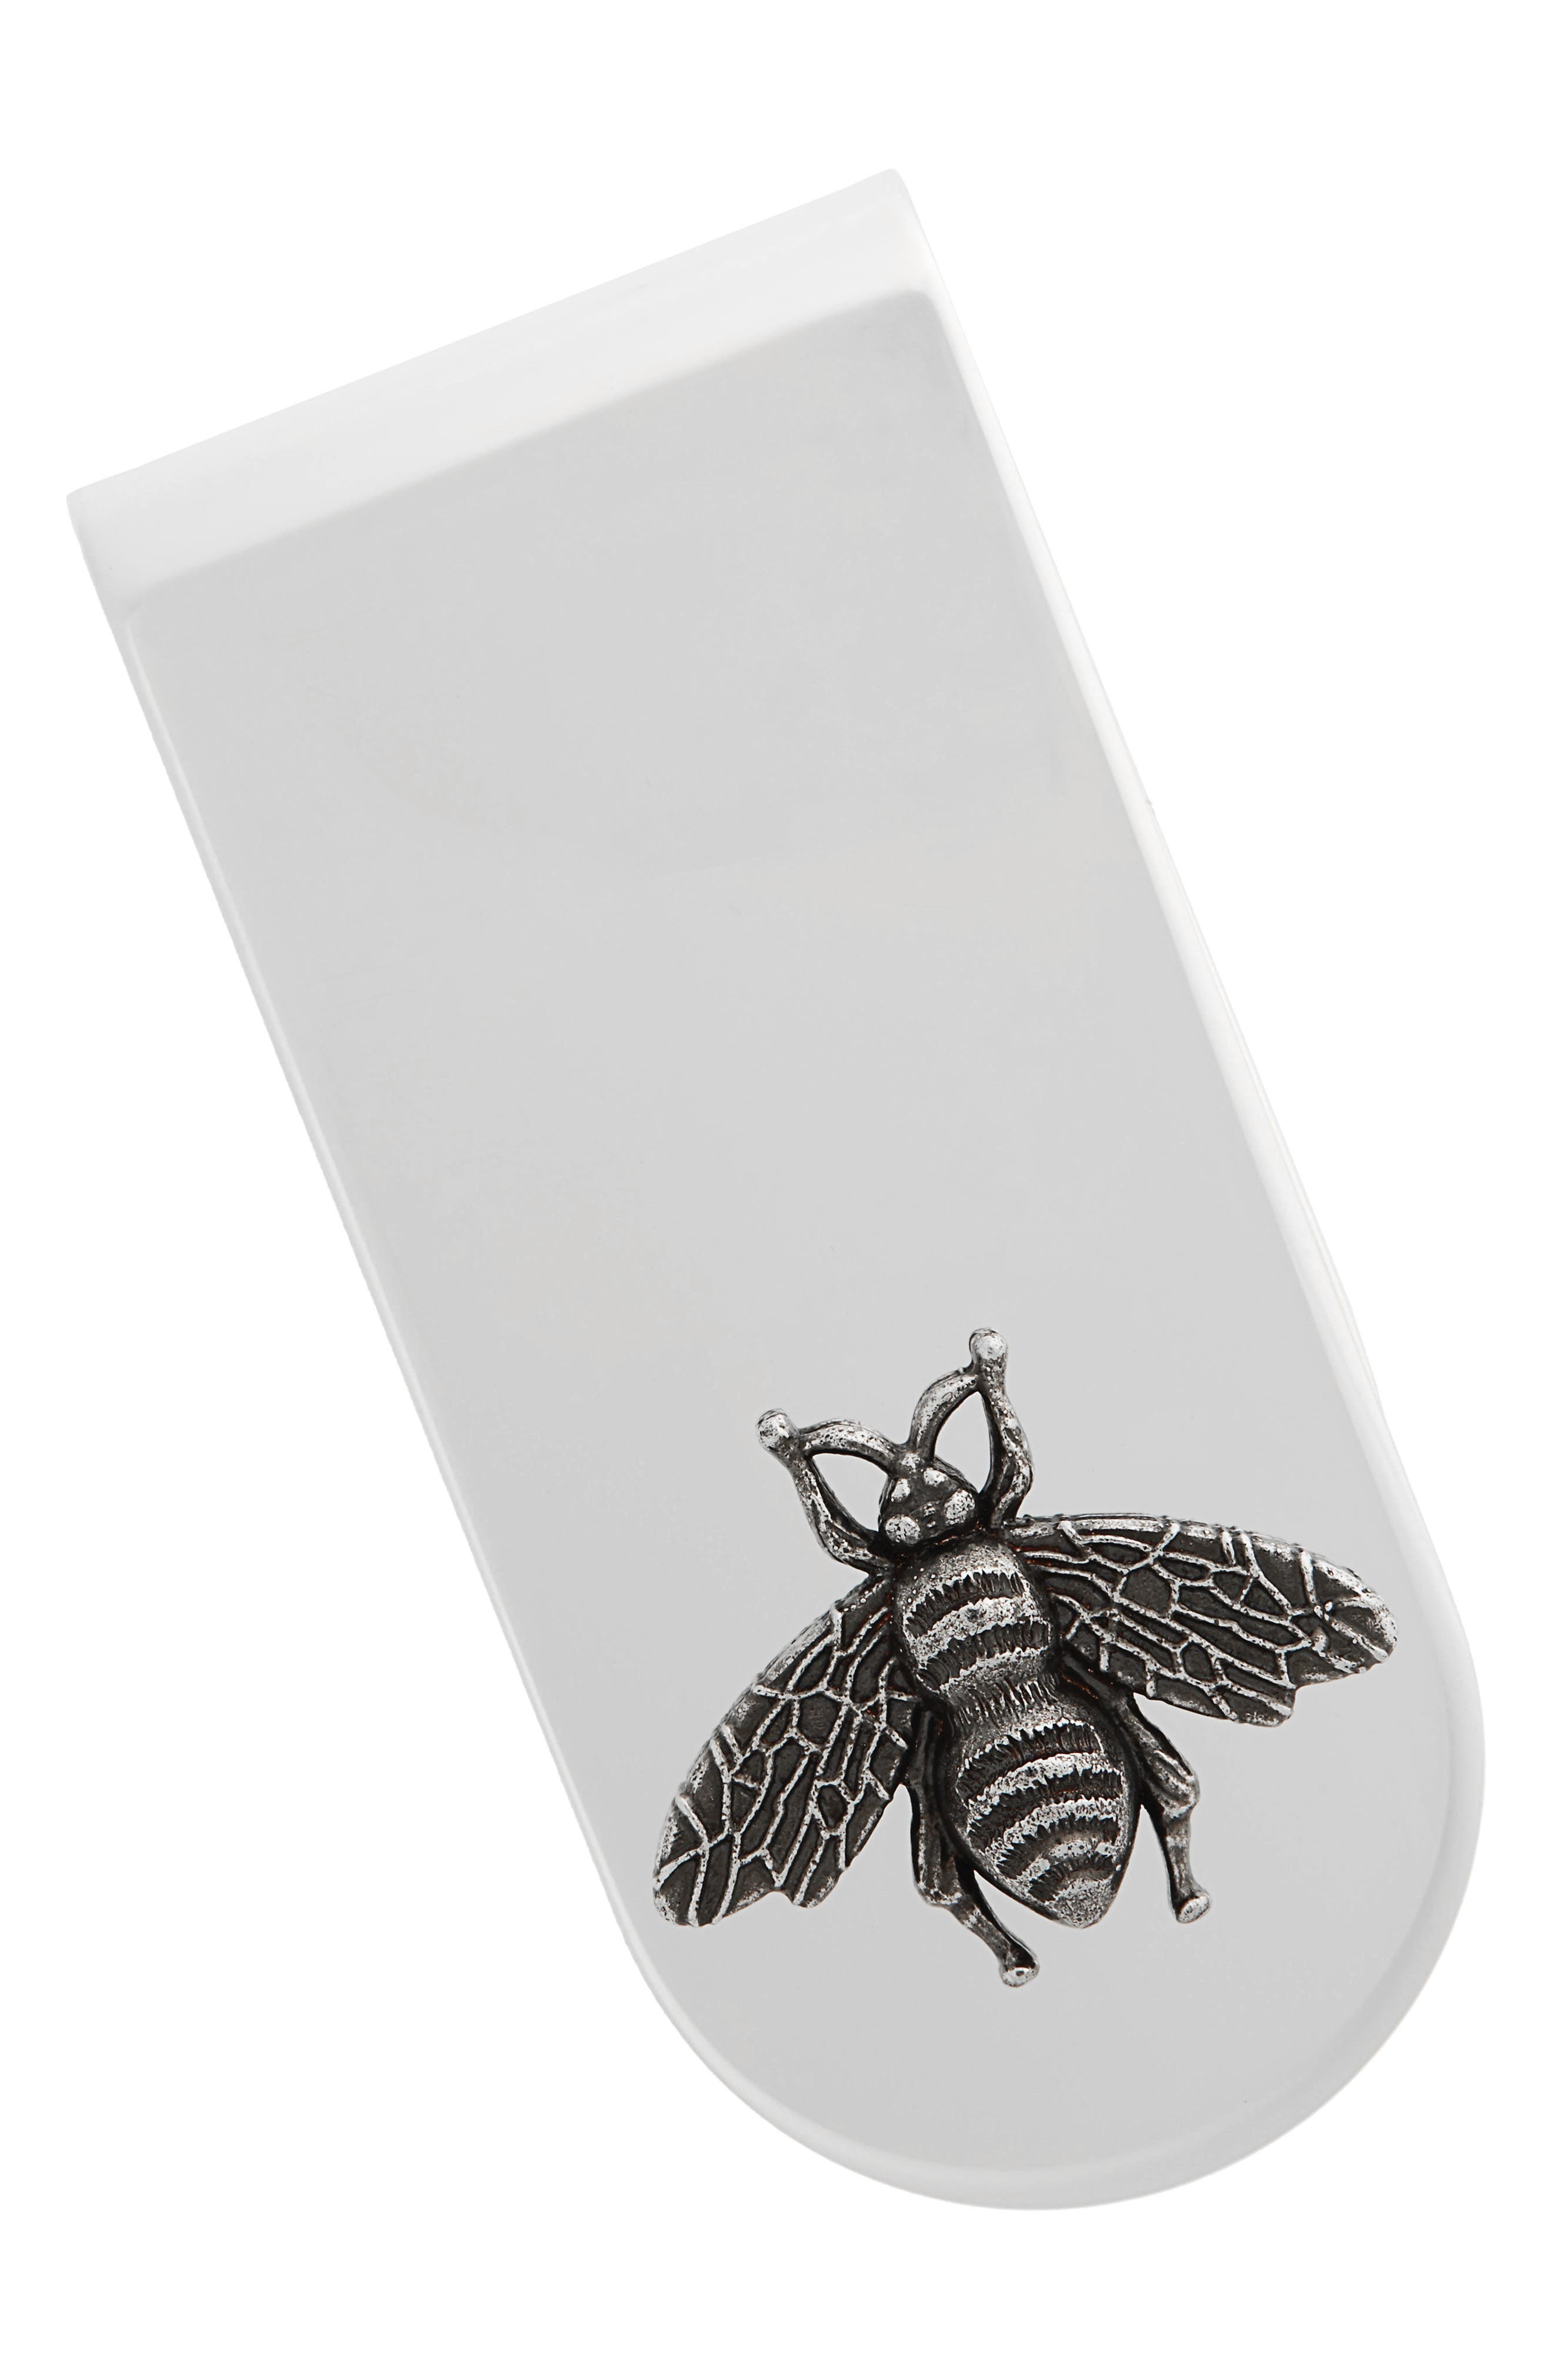 Bee Insignia Brass Money Clip,                         Main,                         color, SILVER